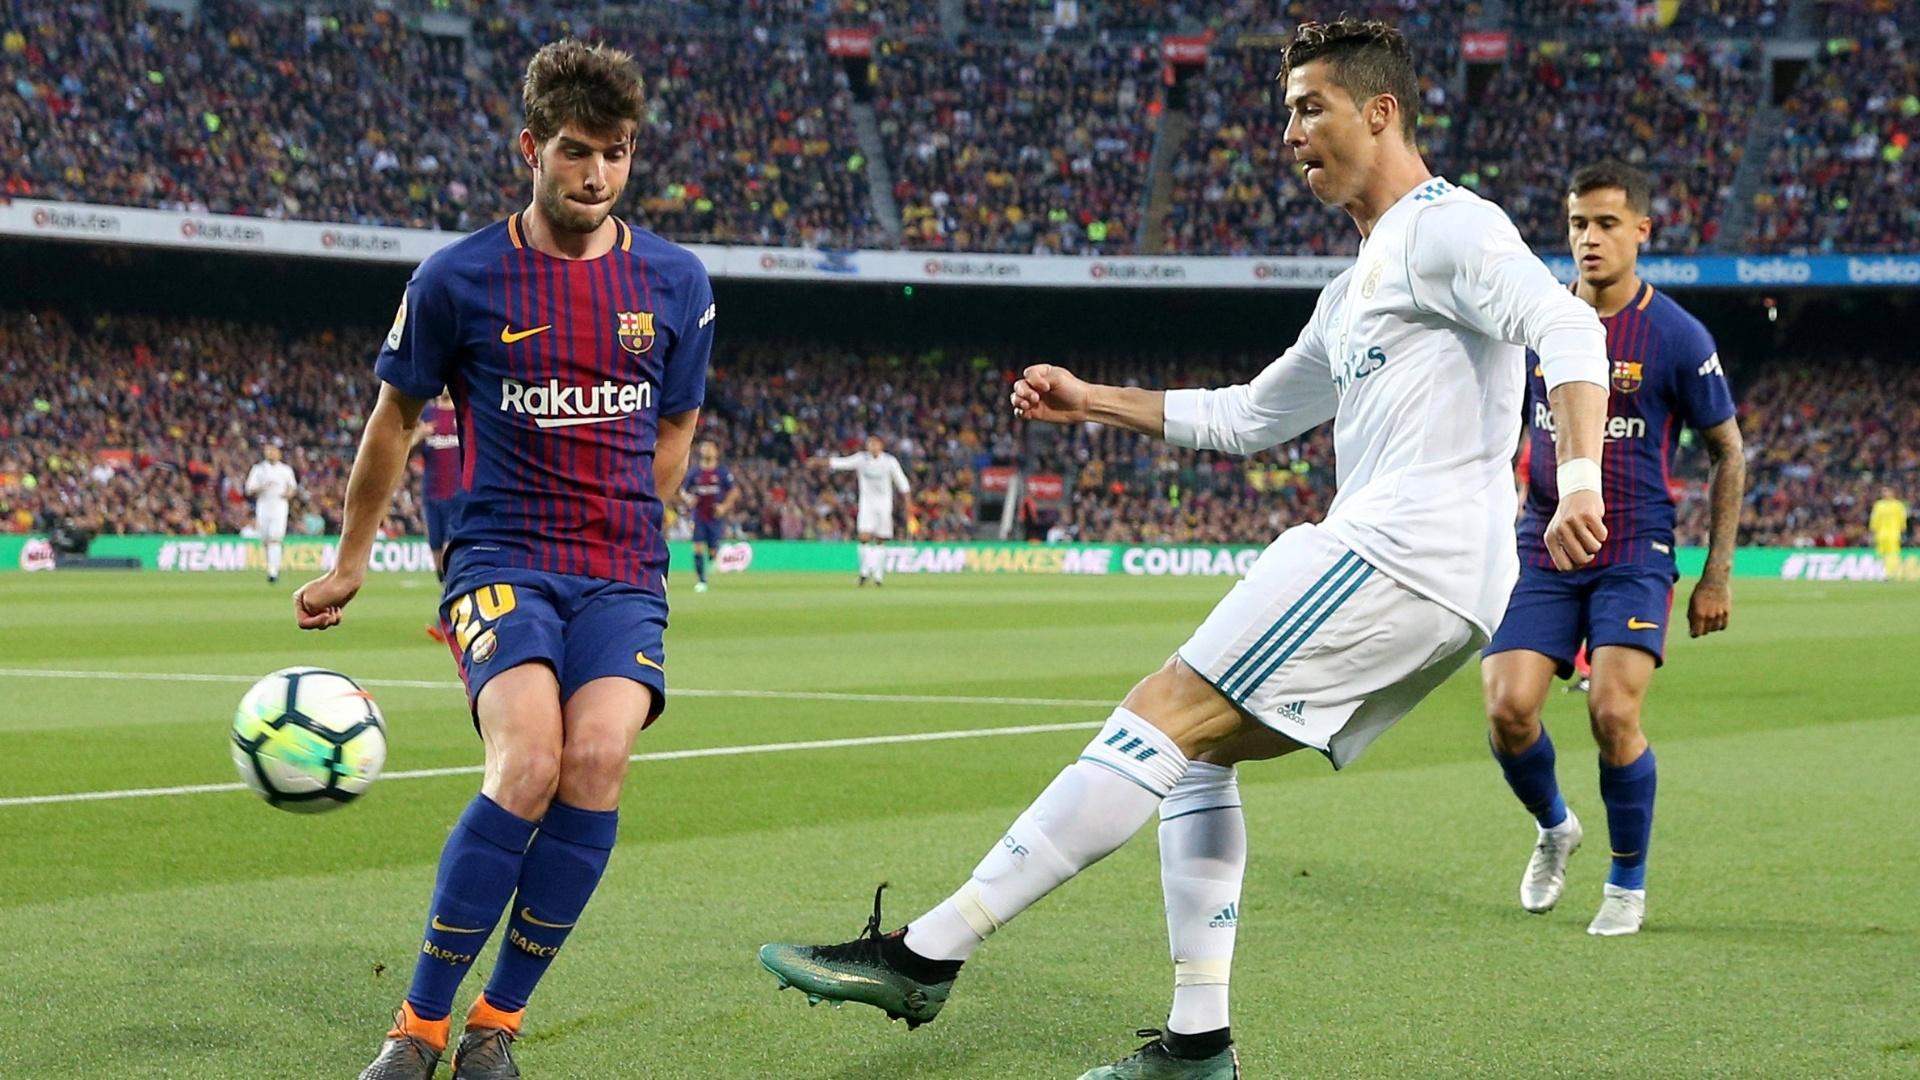 Cristiano Ronaldo tenta o chute durante a partida entre Barcelona e Real Madrid